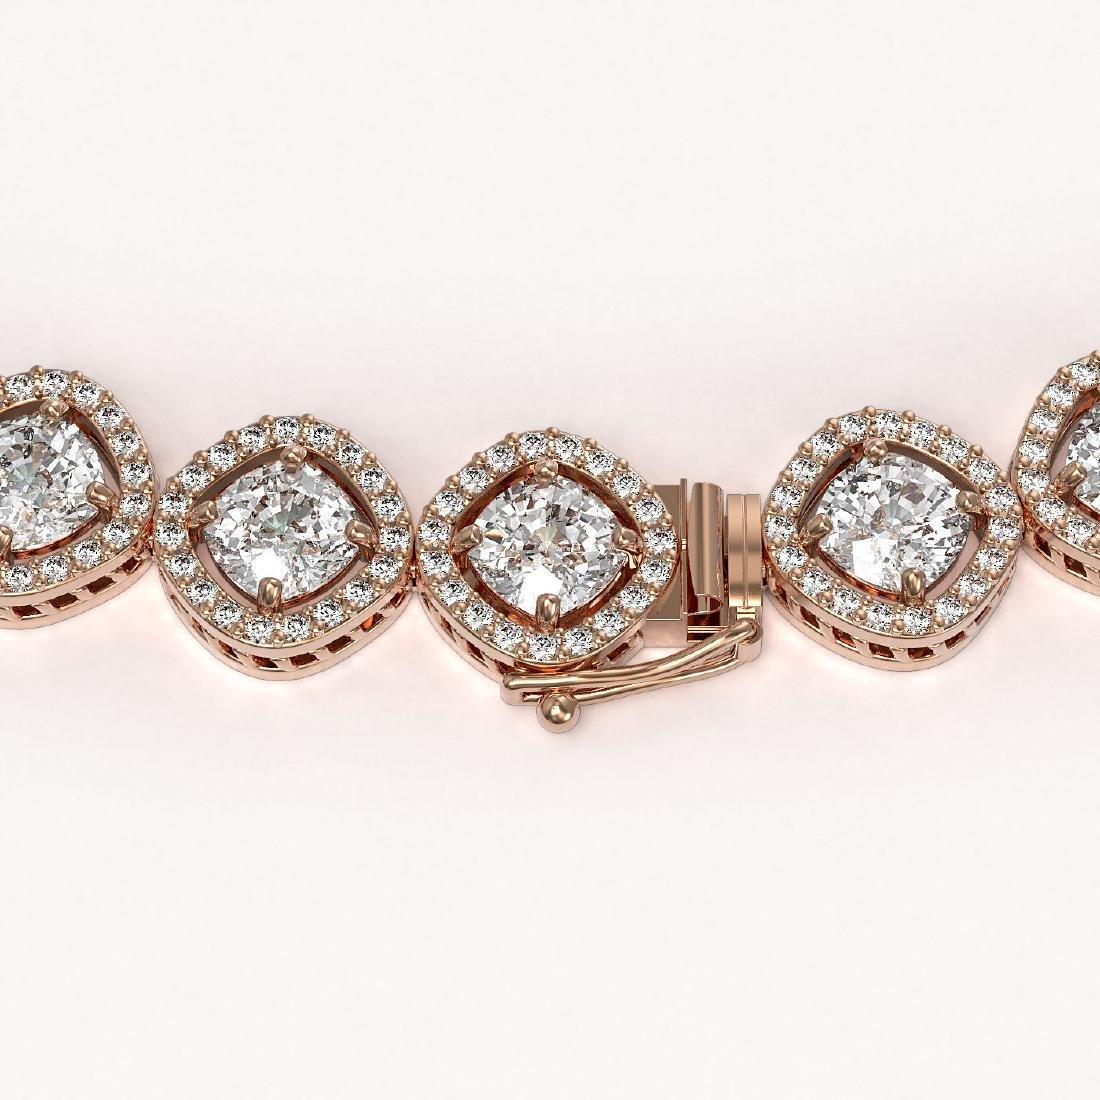 36.09 CTW Cushion Cut Diamond Designer Necklace 18K - 3